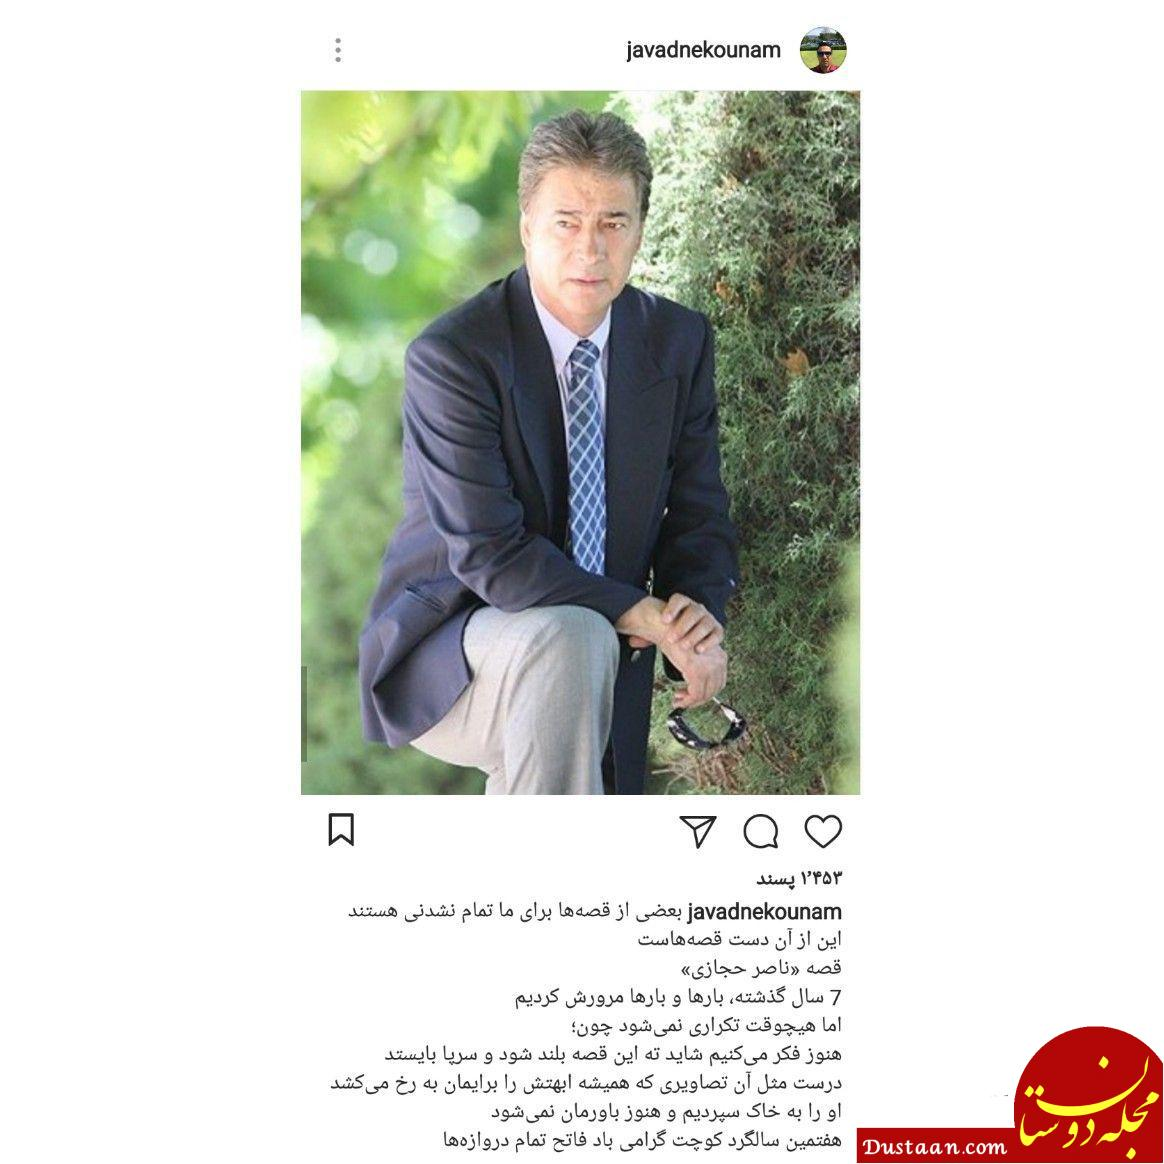 www.dustaan.com پست اینستاگرامی جواد نکونام در سالروز درگذشت ناصر حجازی